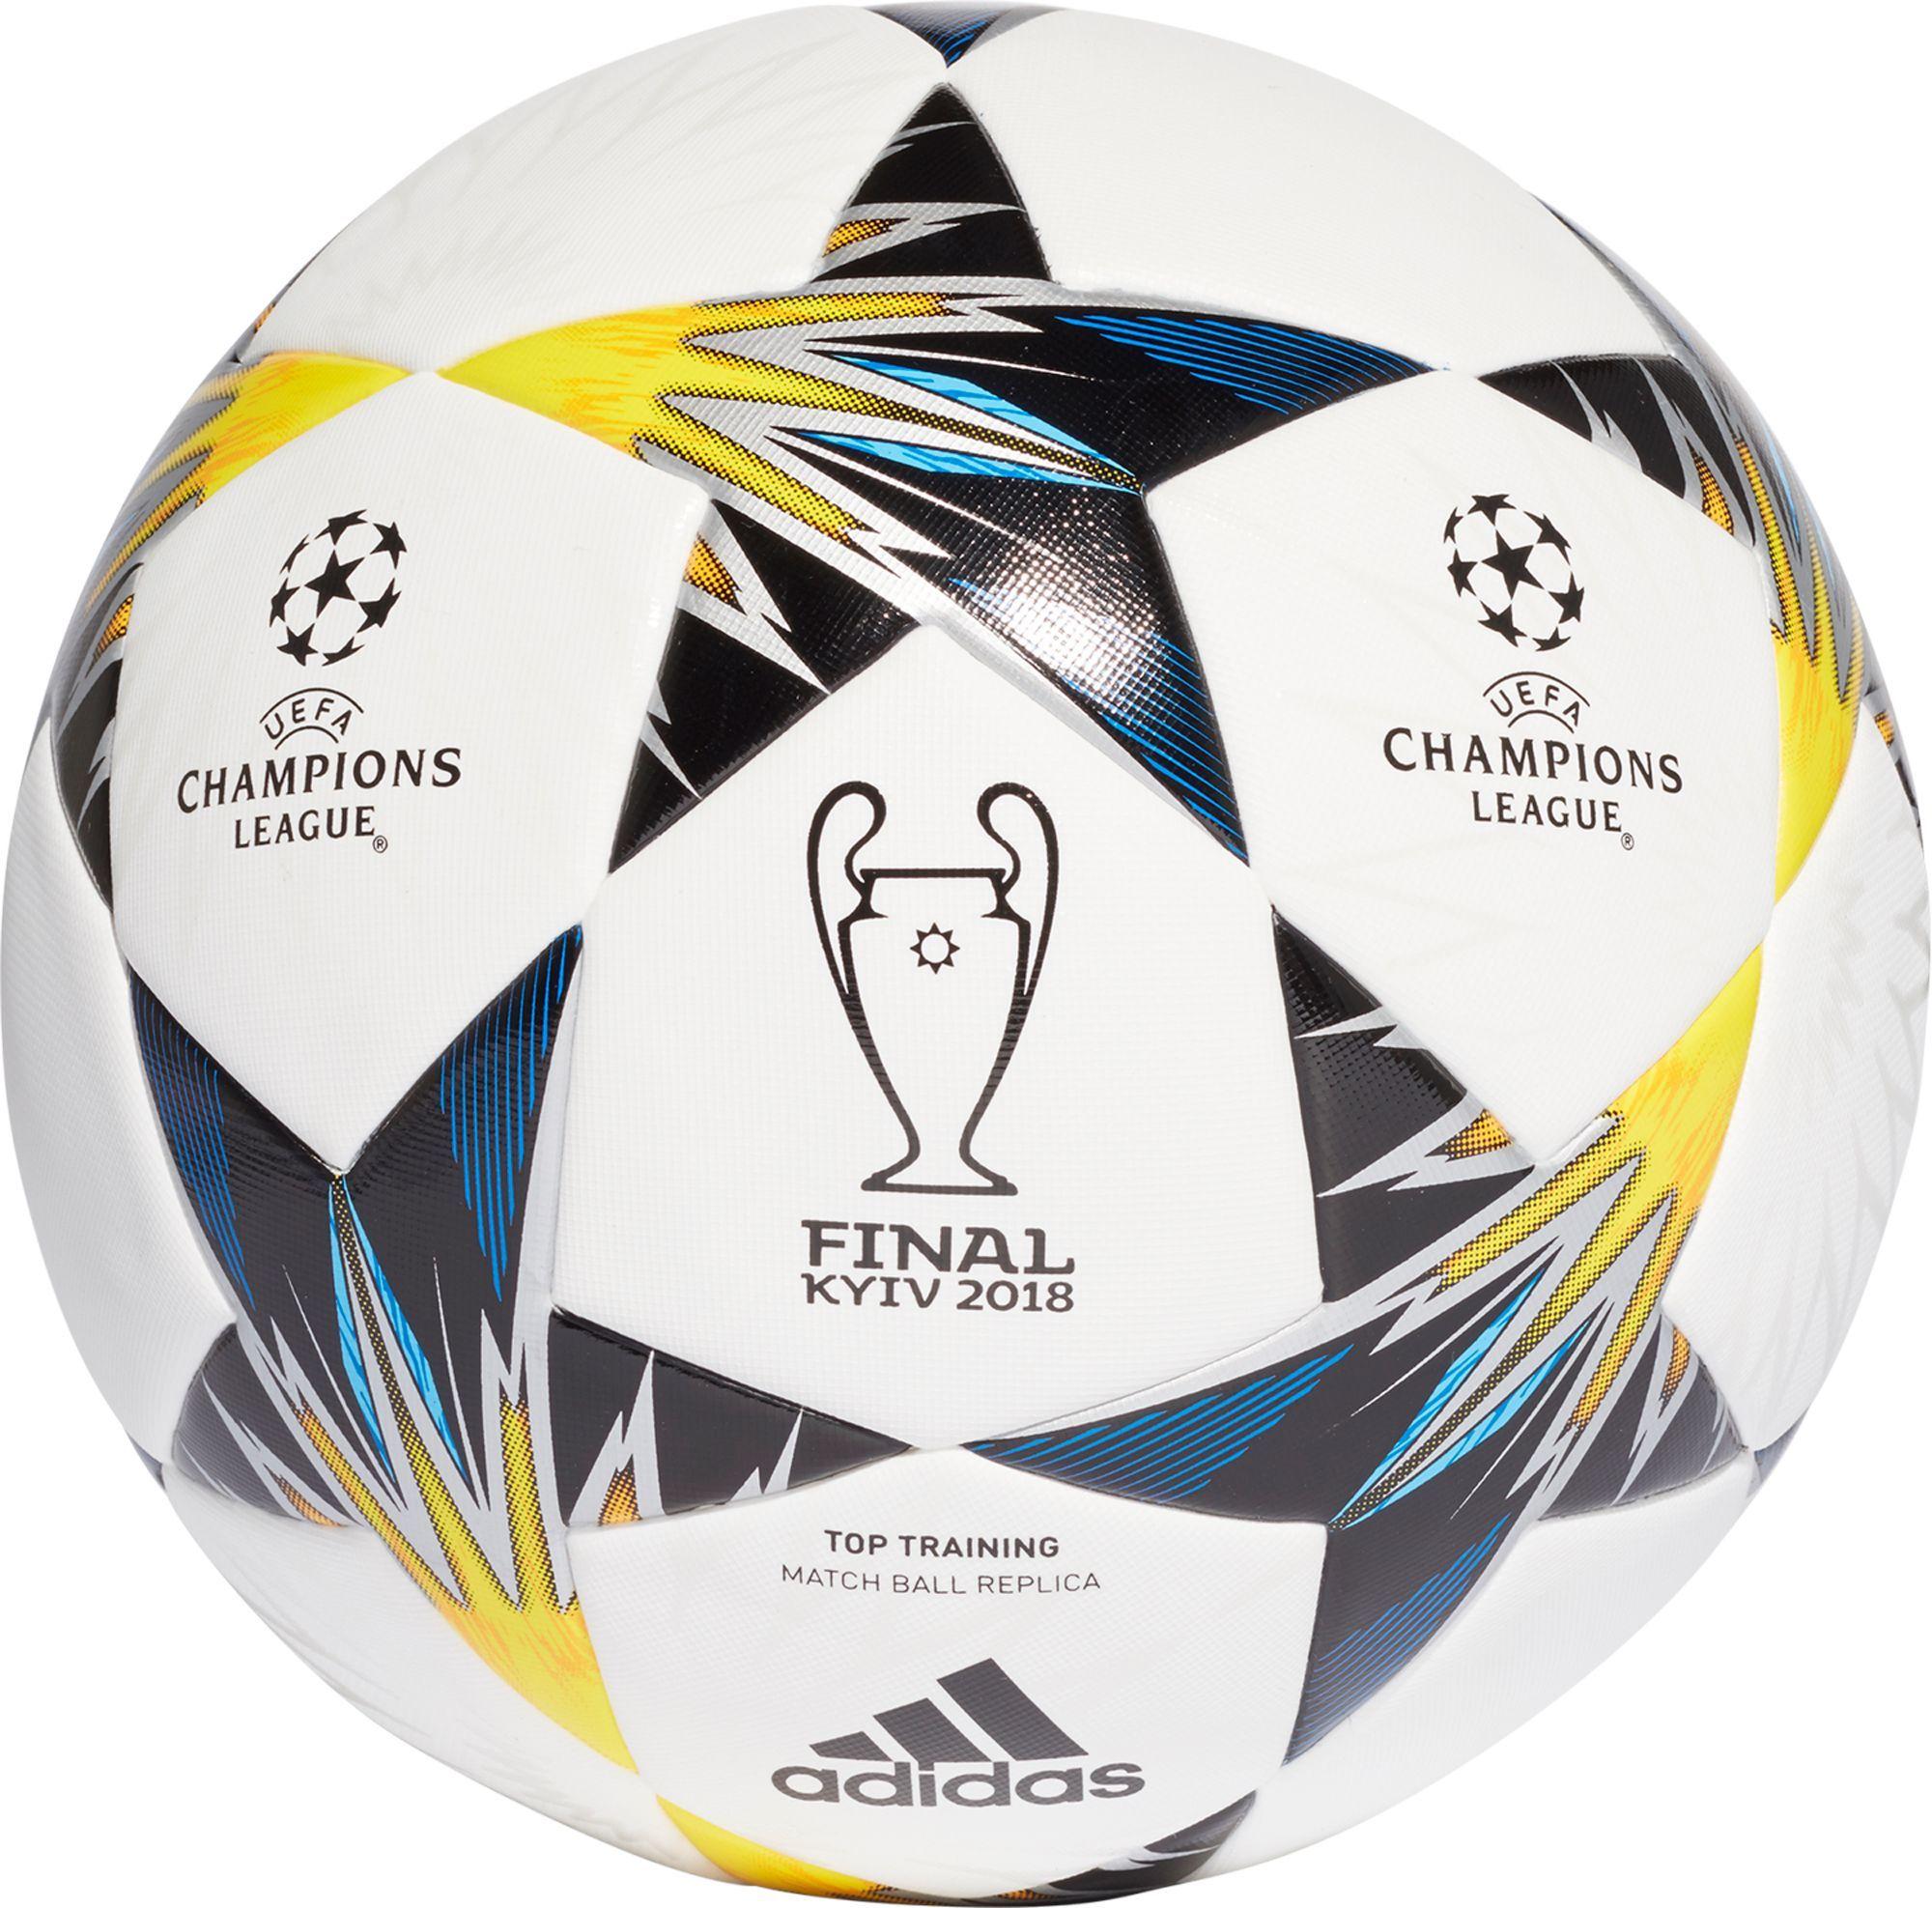 adidas Uefa Champions League Finale 2018 Kiev Top Training ...